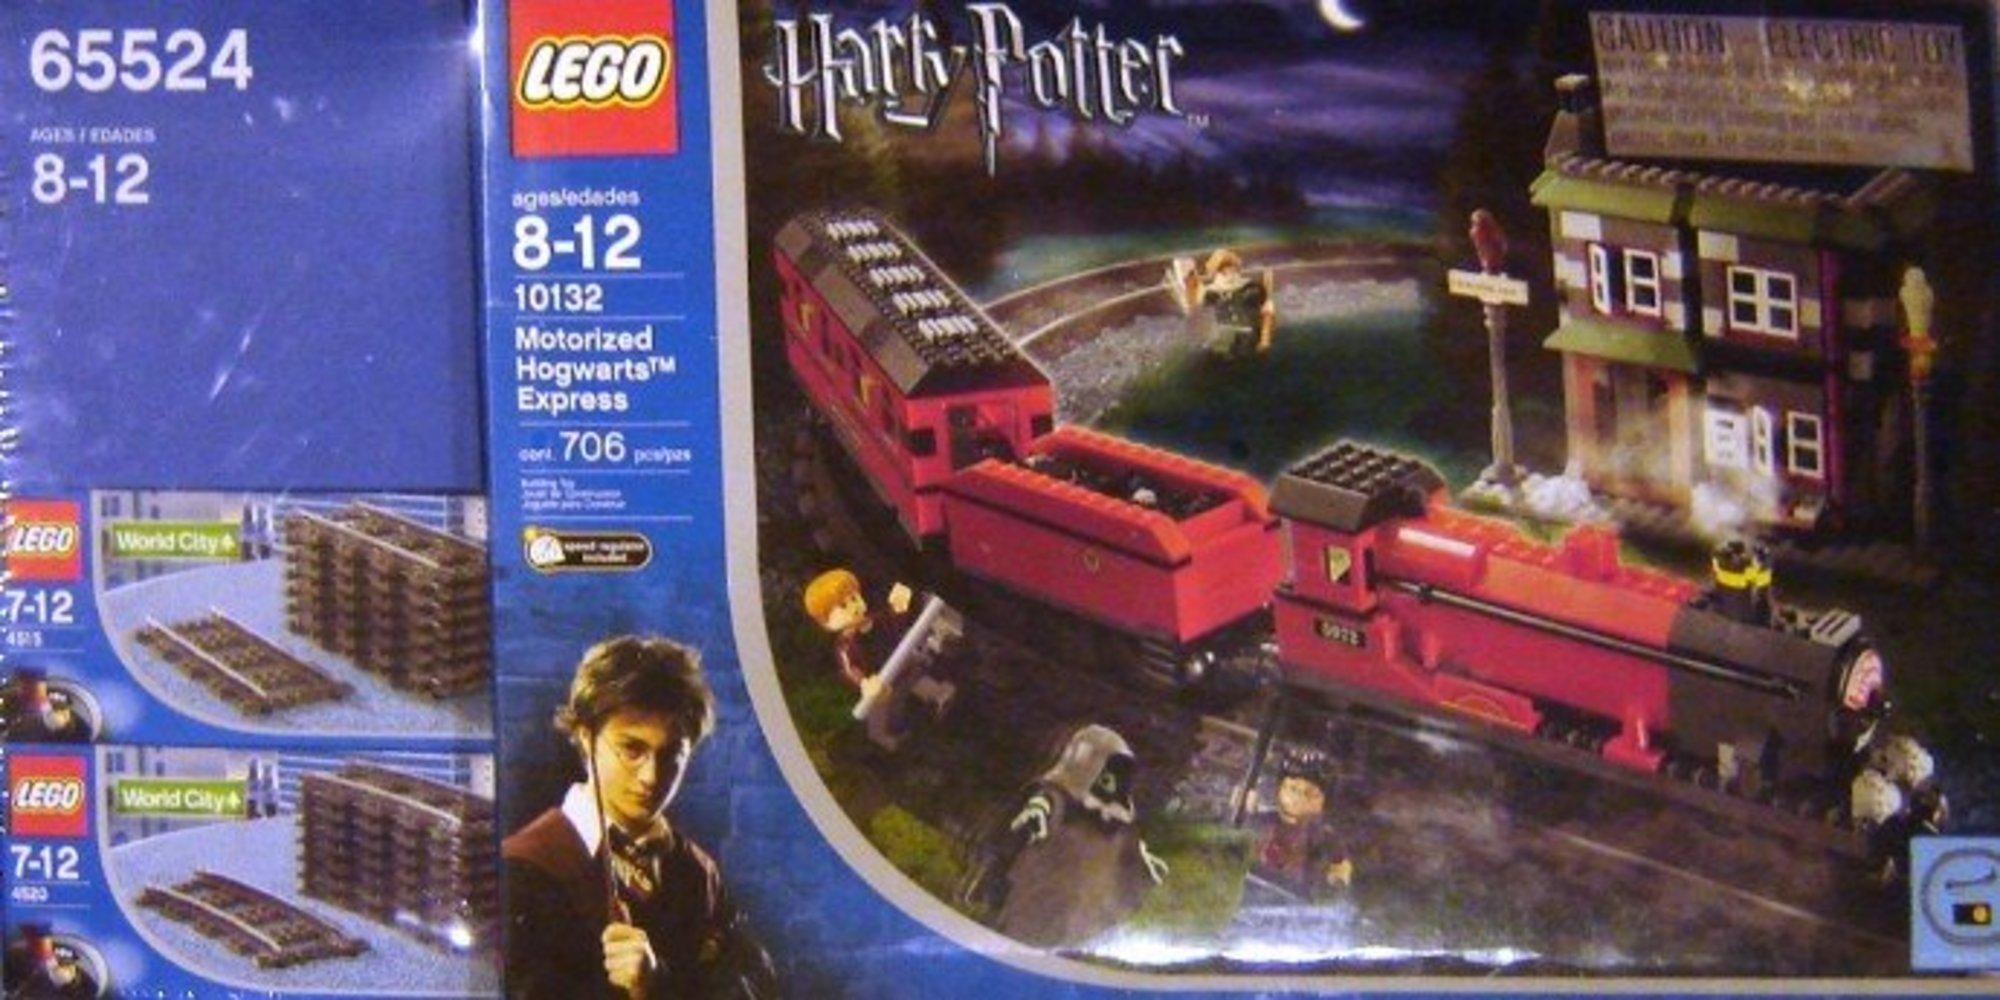 Motorized Hogwarts Express Value-pack